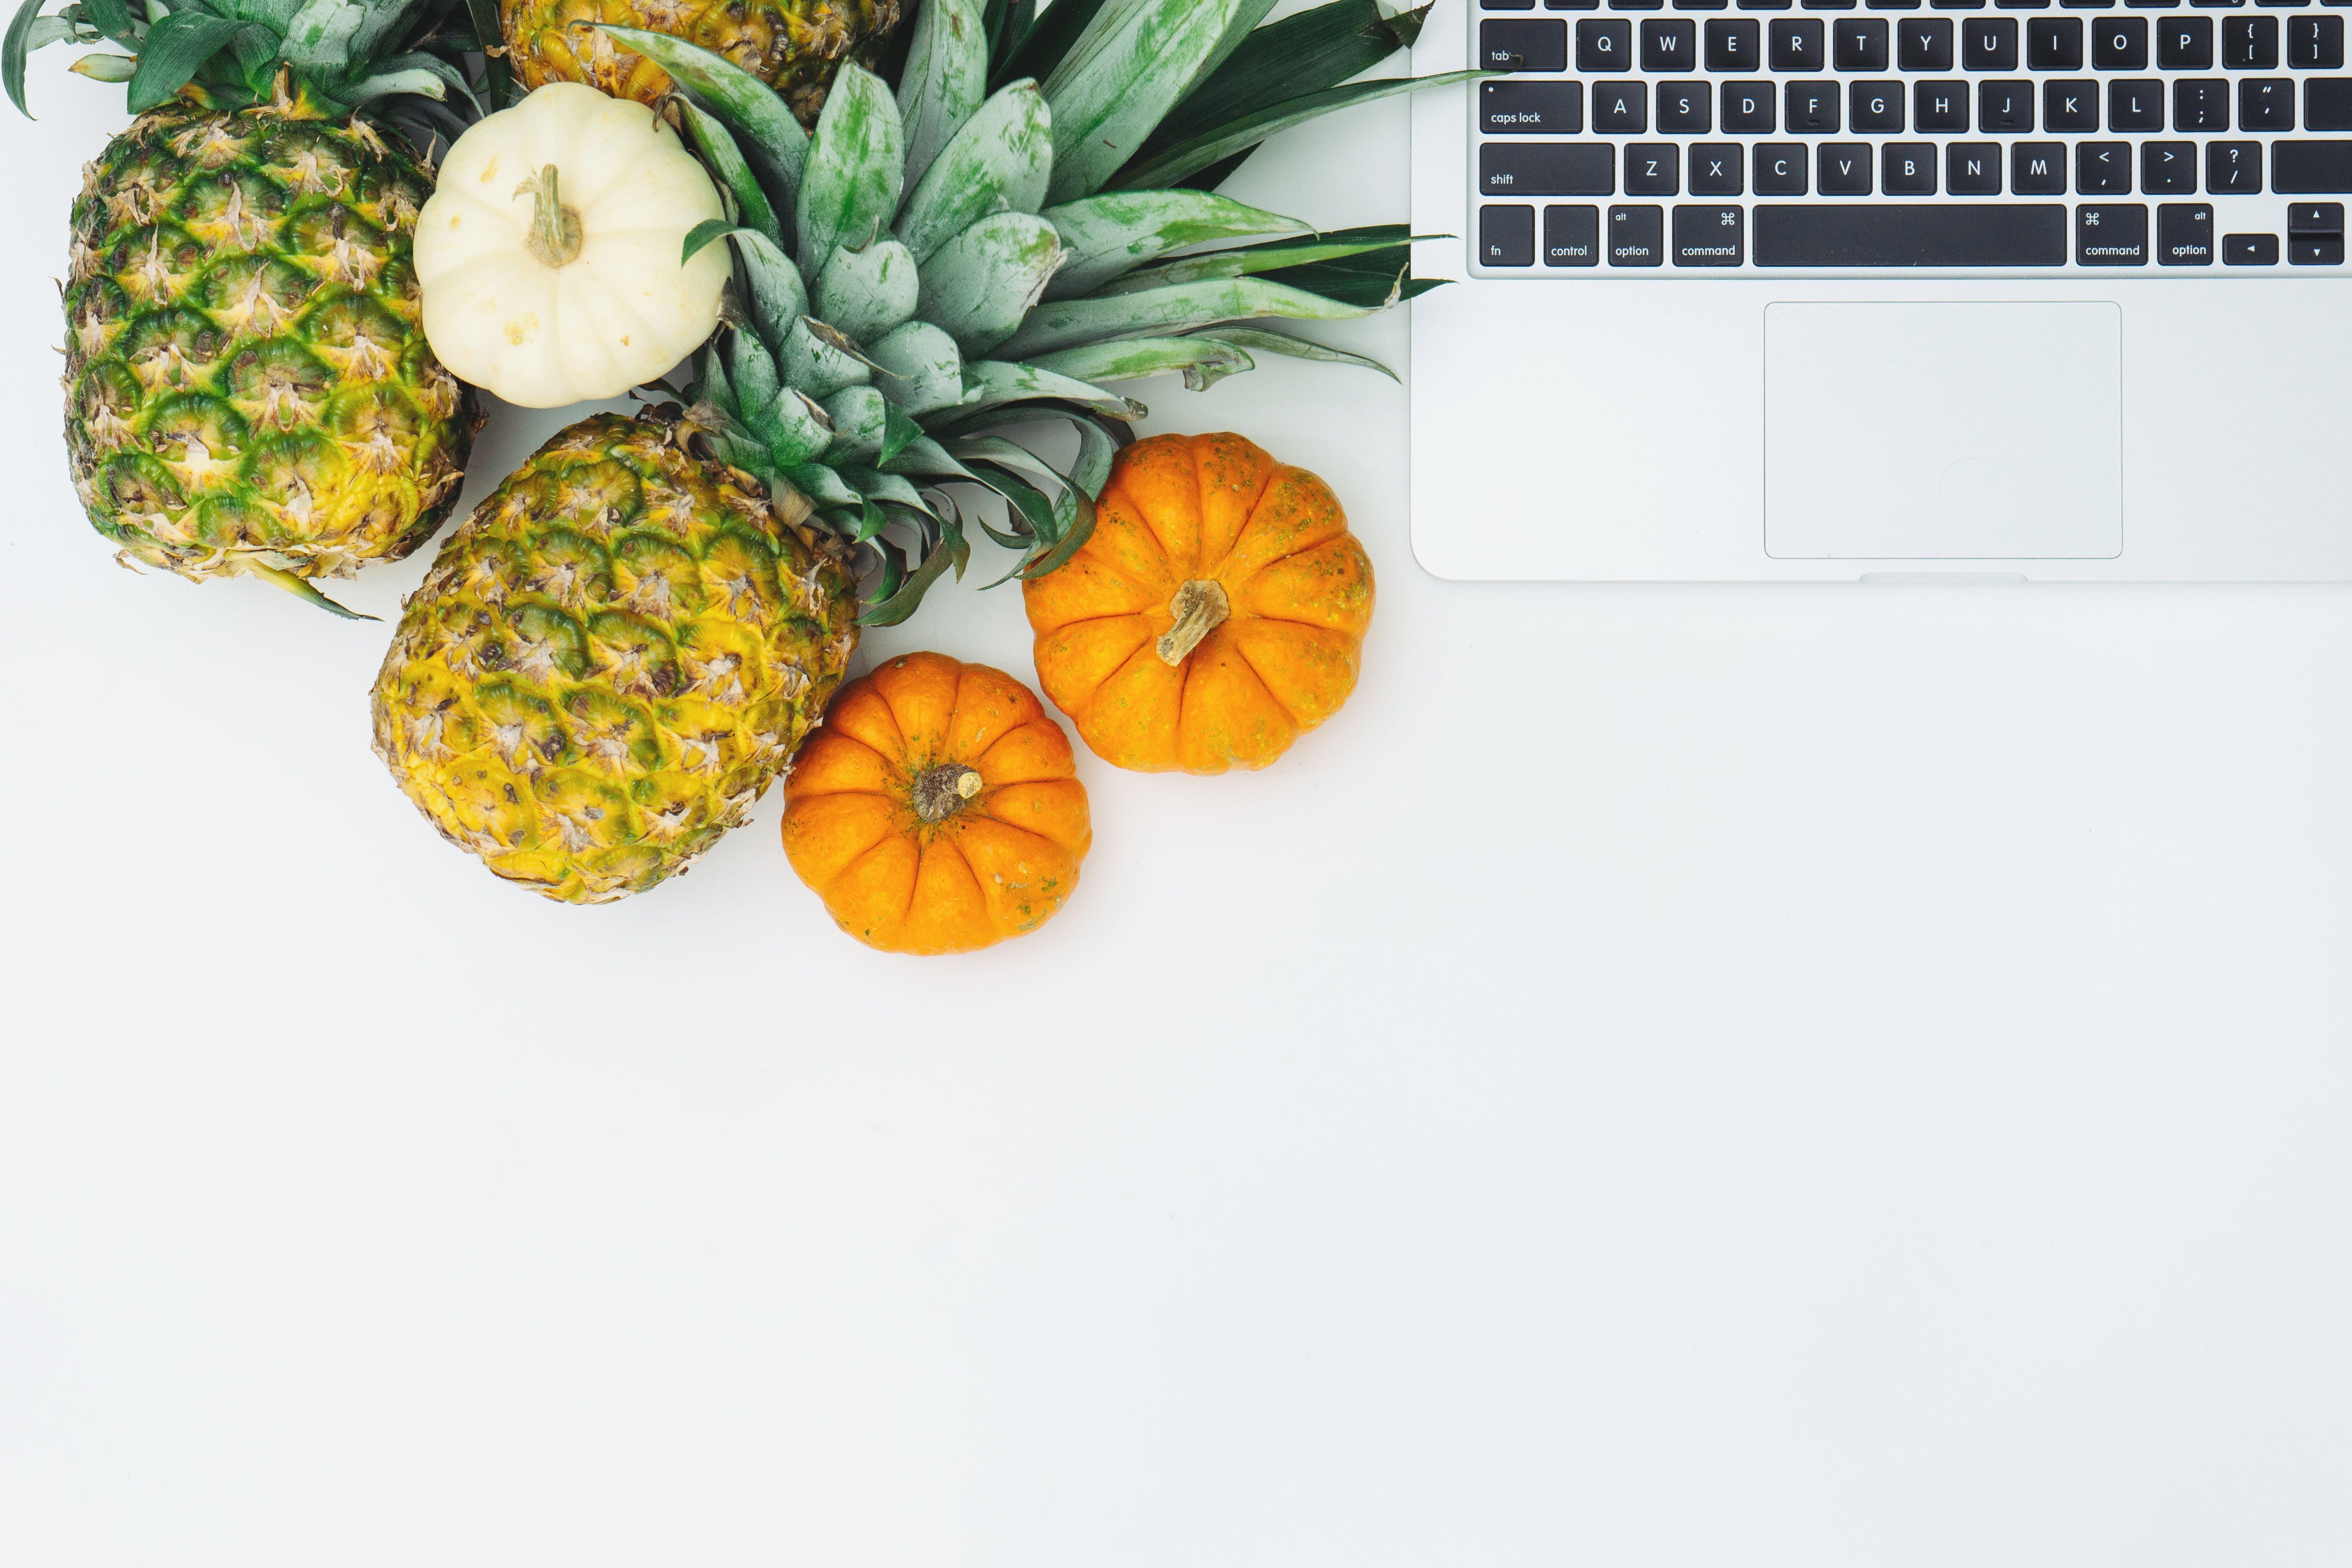 iphone, かぼちゃ, ひょうたん, オーバーヘッドの無料の写真素材